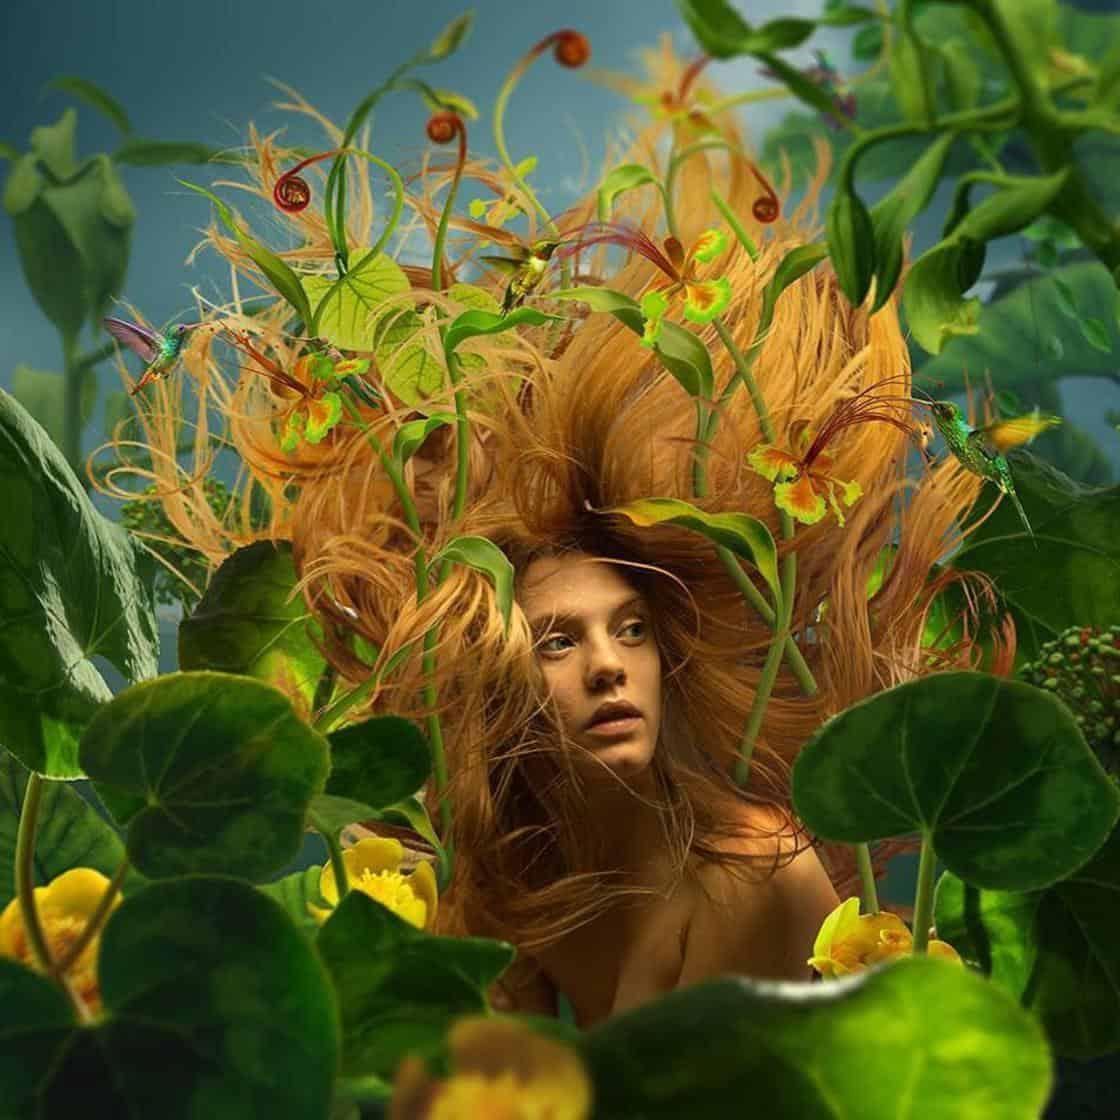 elena vizerskaya surreal photography 22